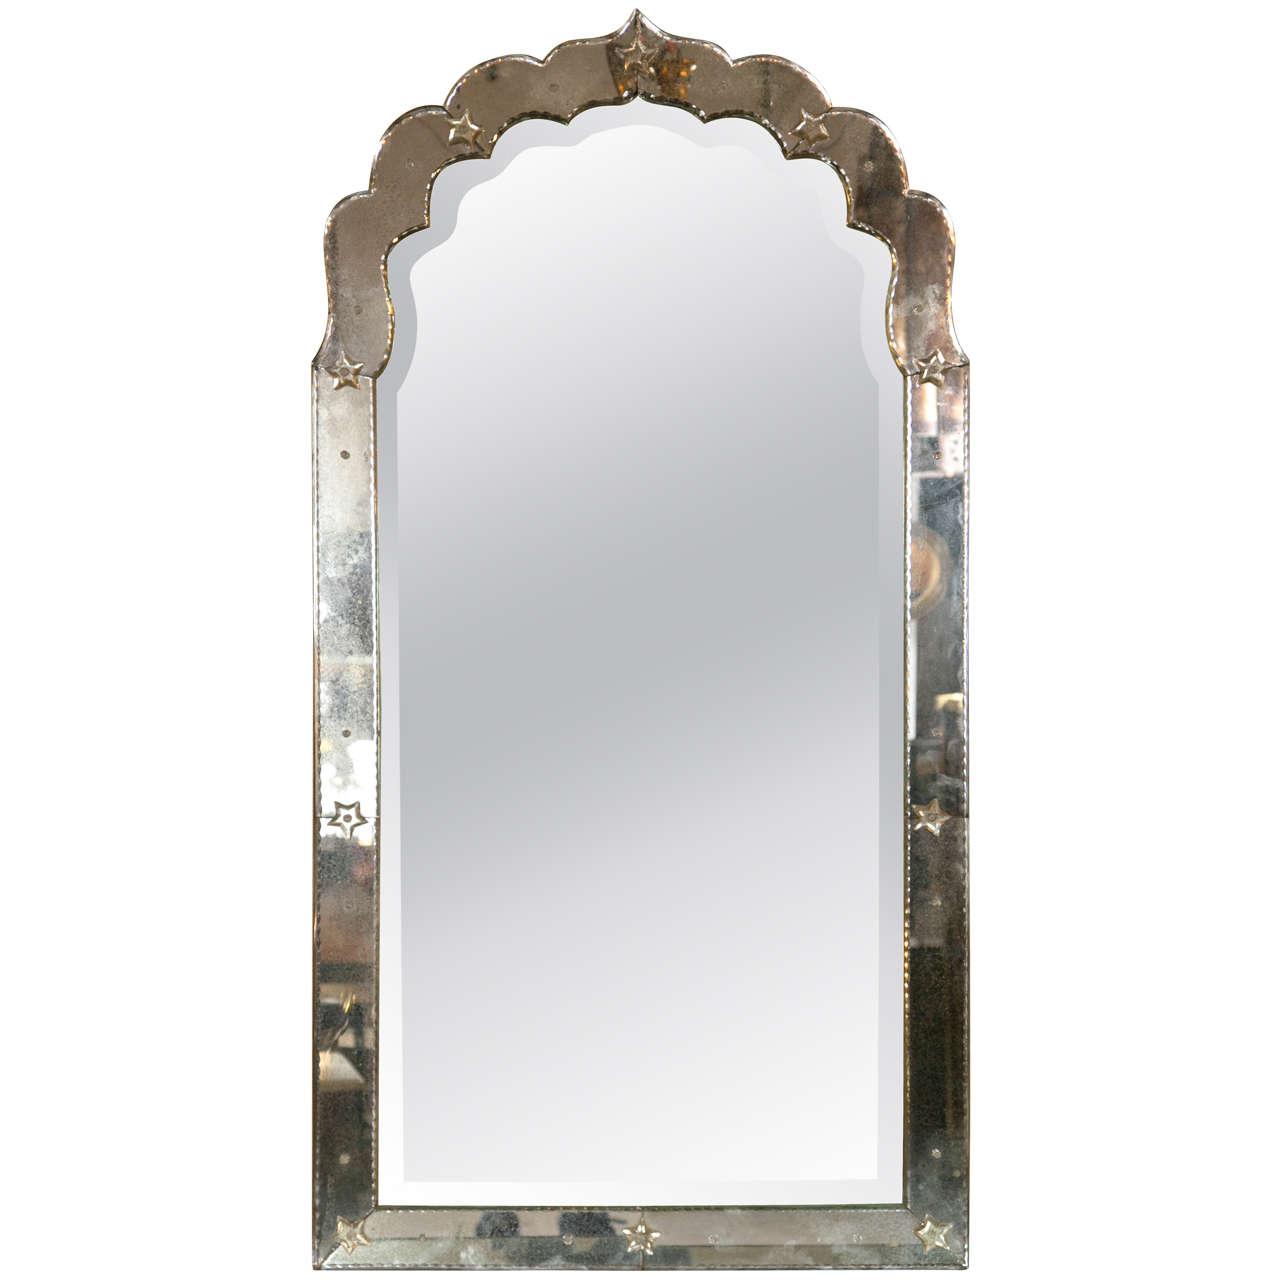 Elegant Absolutely Stunning Antiqued Hollywood Regency Venetian Doris Duke Style  Pair Of Mirrors. The Fine Beveled